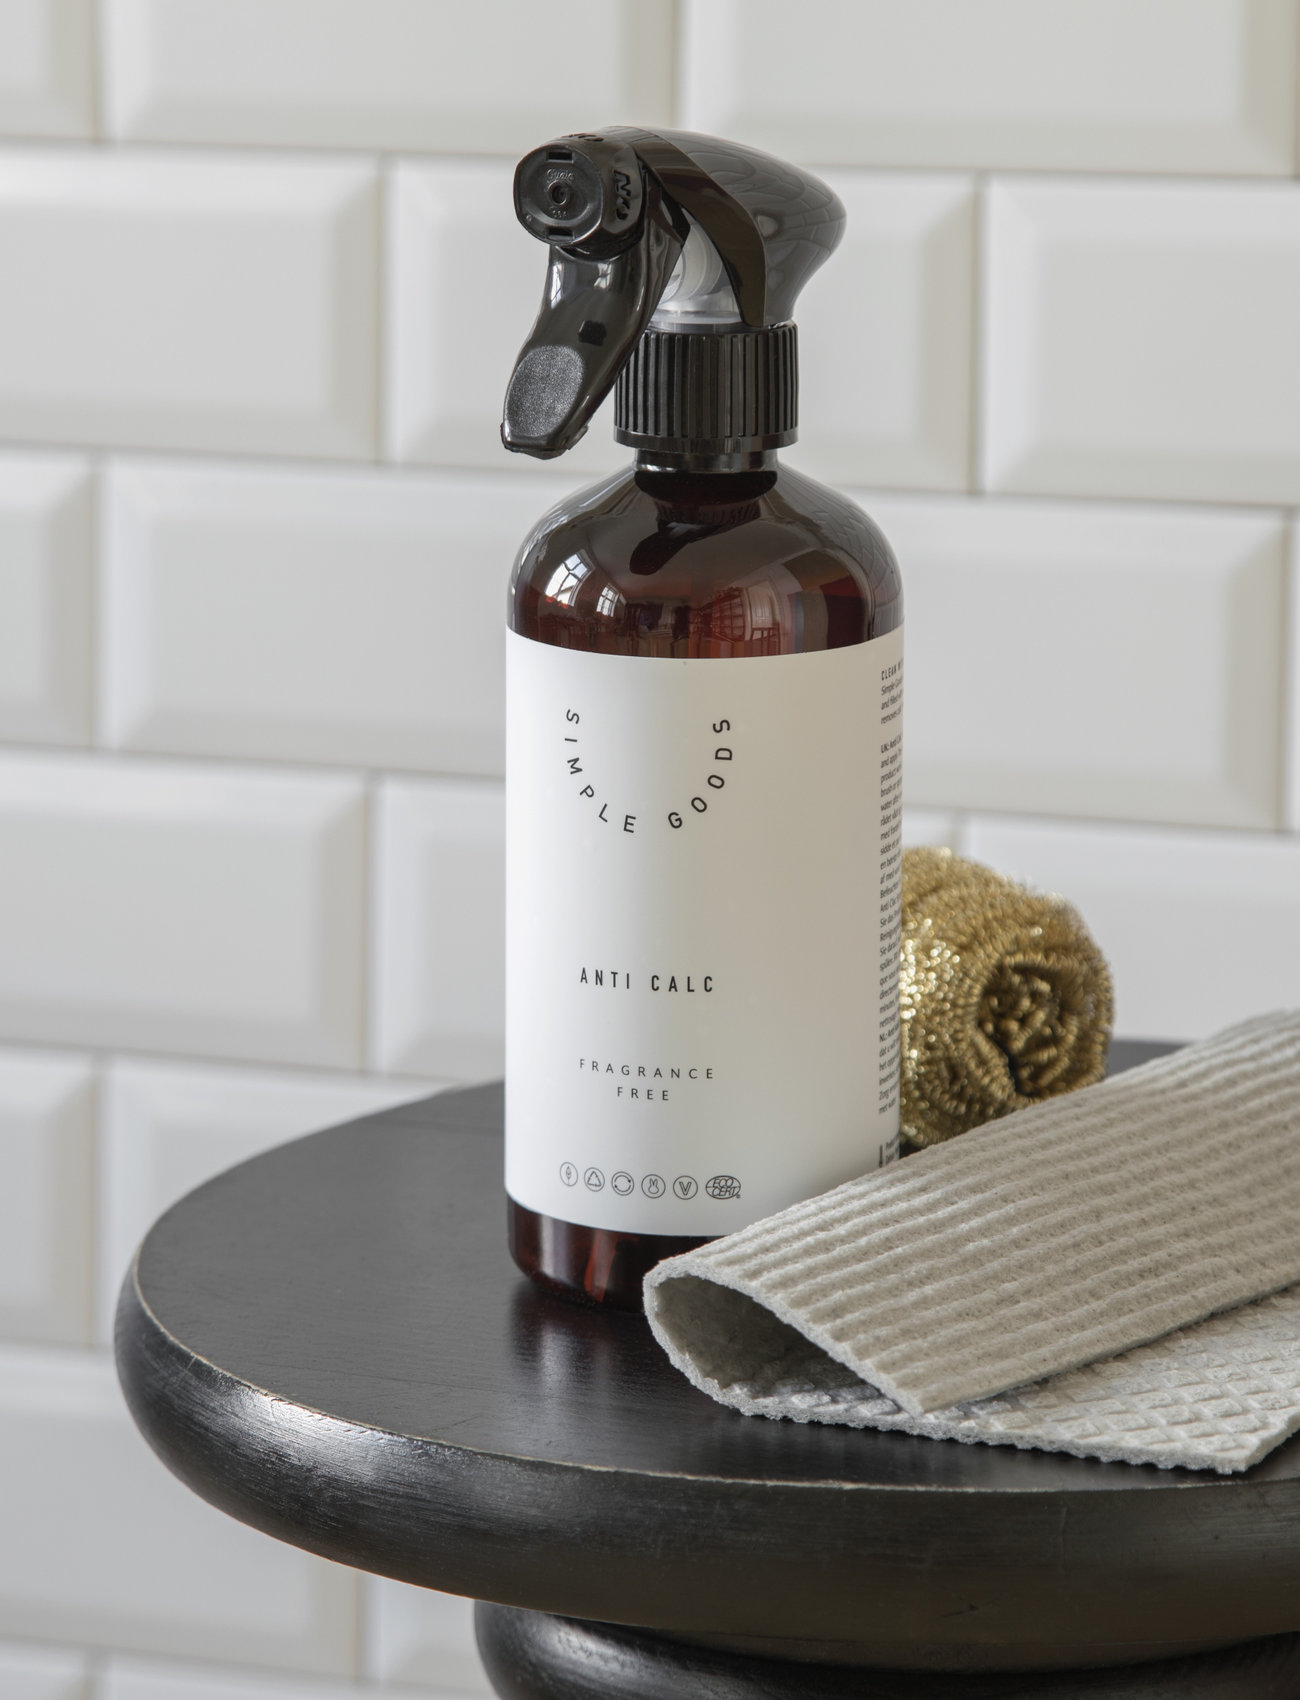 Simple Goods - Anti Calc, Fragrance Free - Övrigt diskning & städning - clear - 1